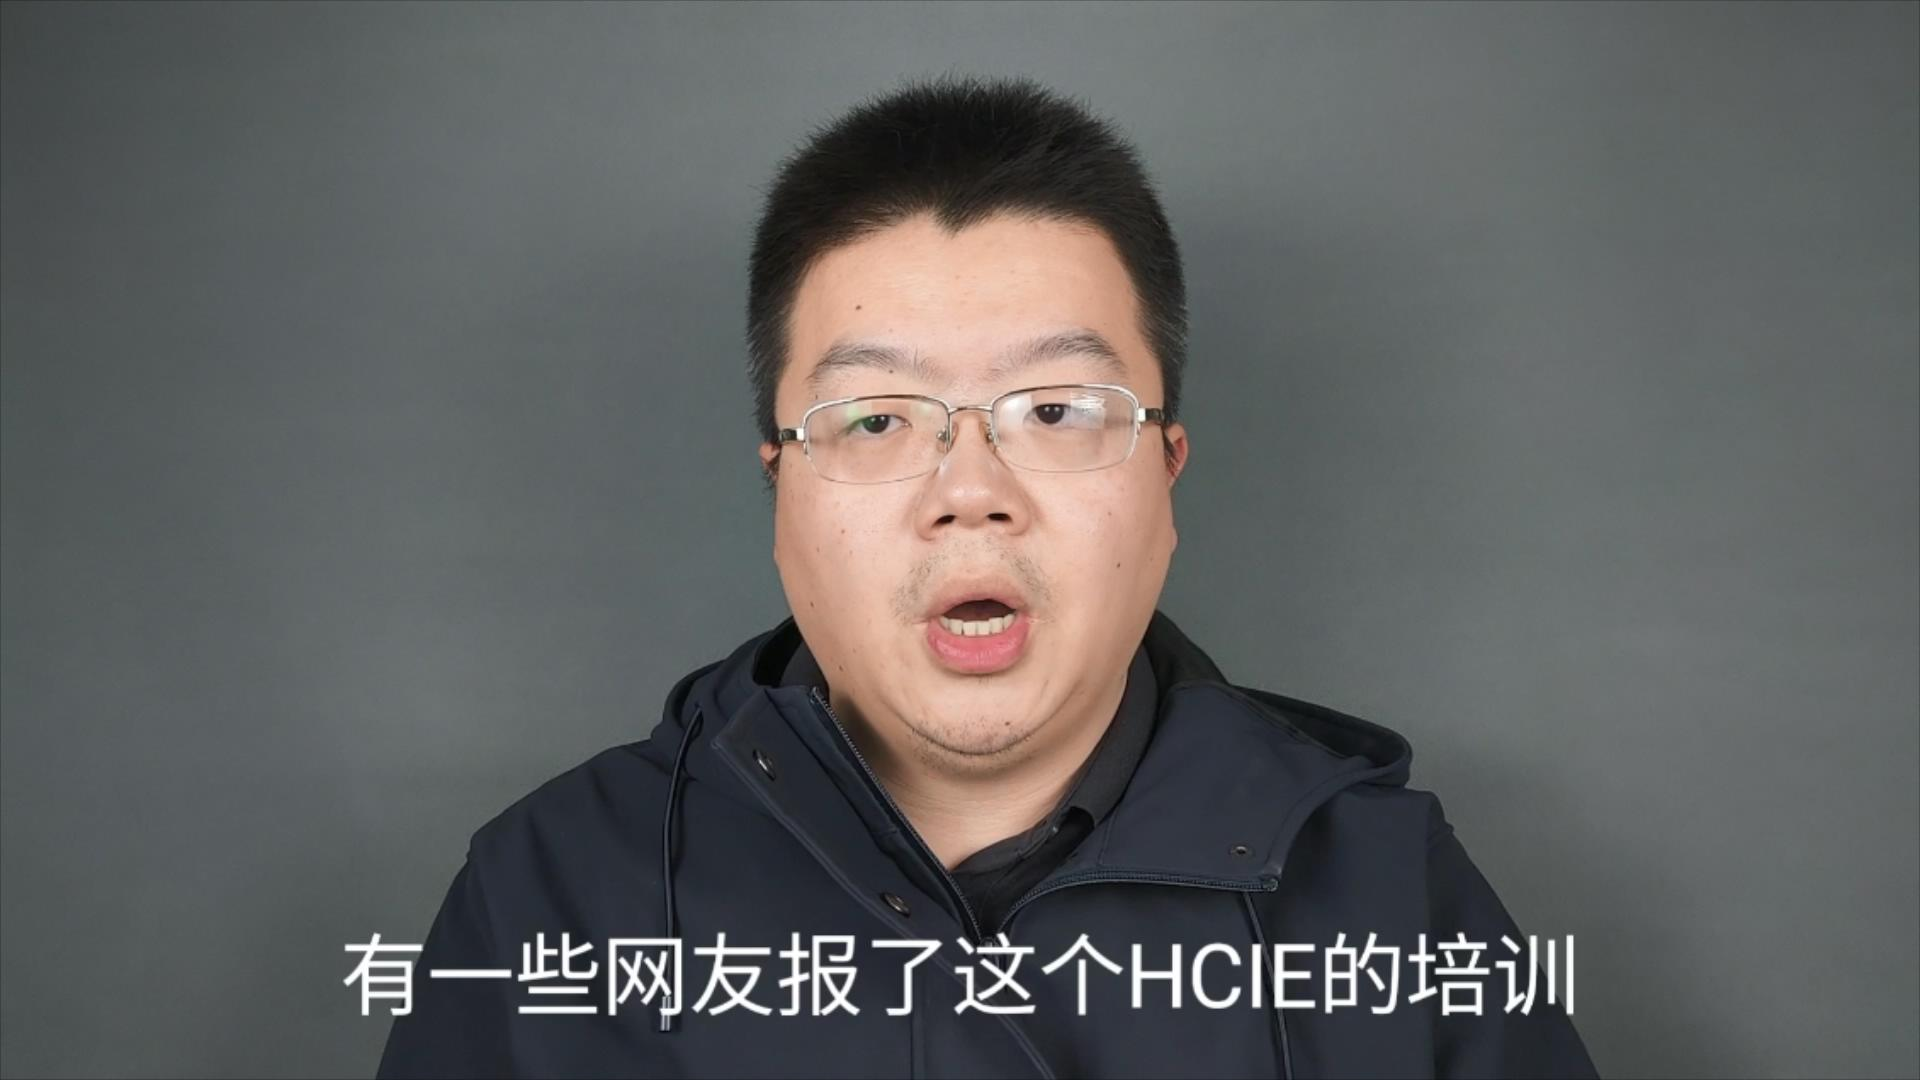 HCIE学习但是不考试好找工作吗